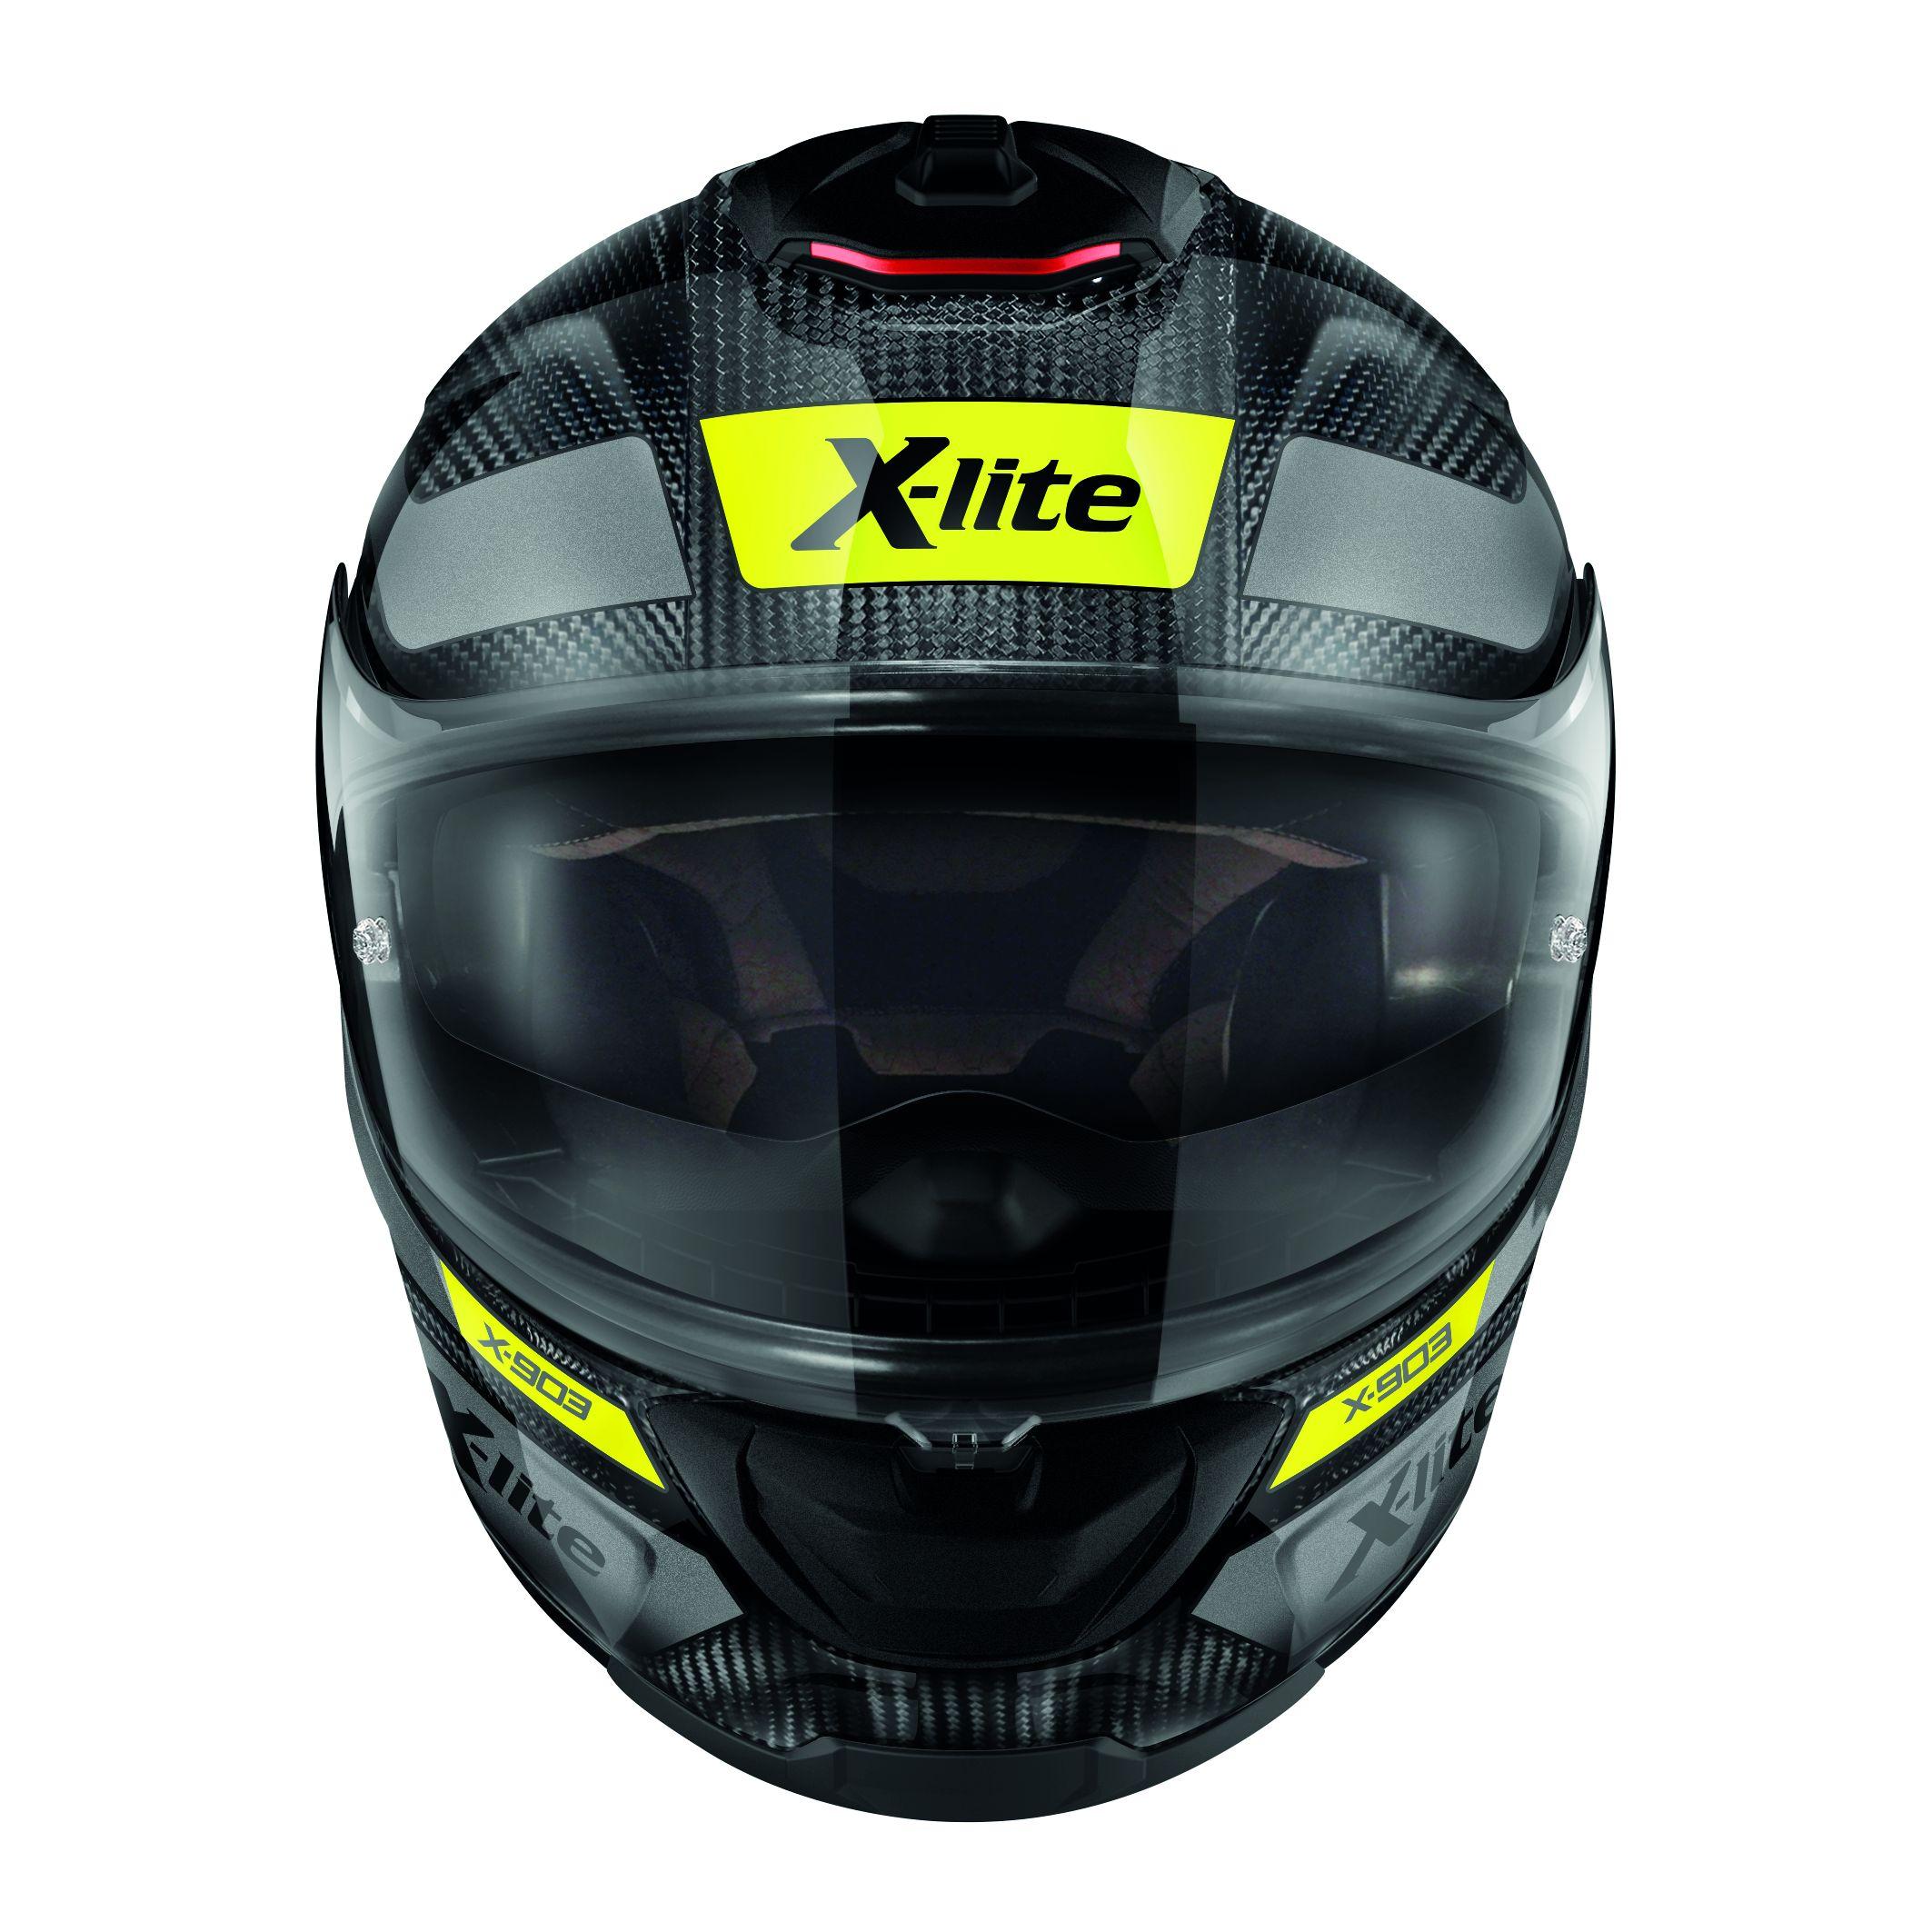 x lite helmet full face x 903 ultra carbon airborne microlock 020. Black Bedroom Furniture Sets. Home Design Ideas